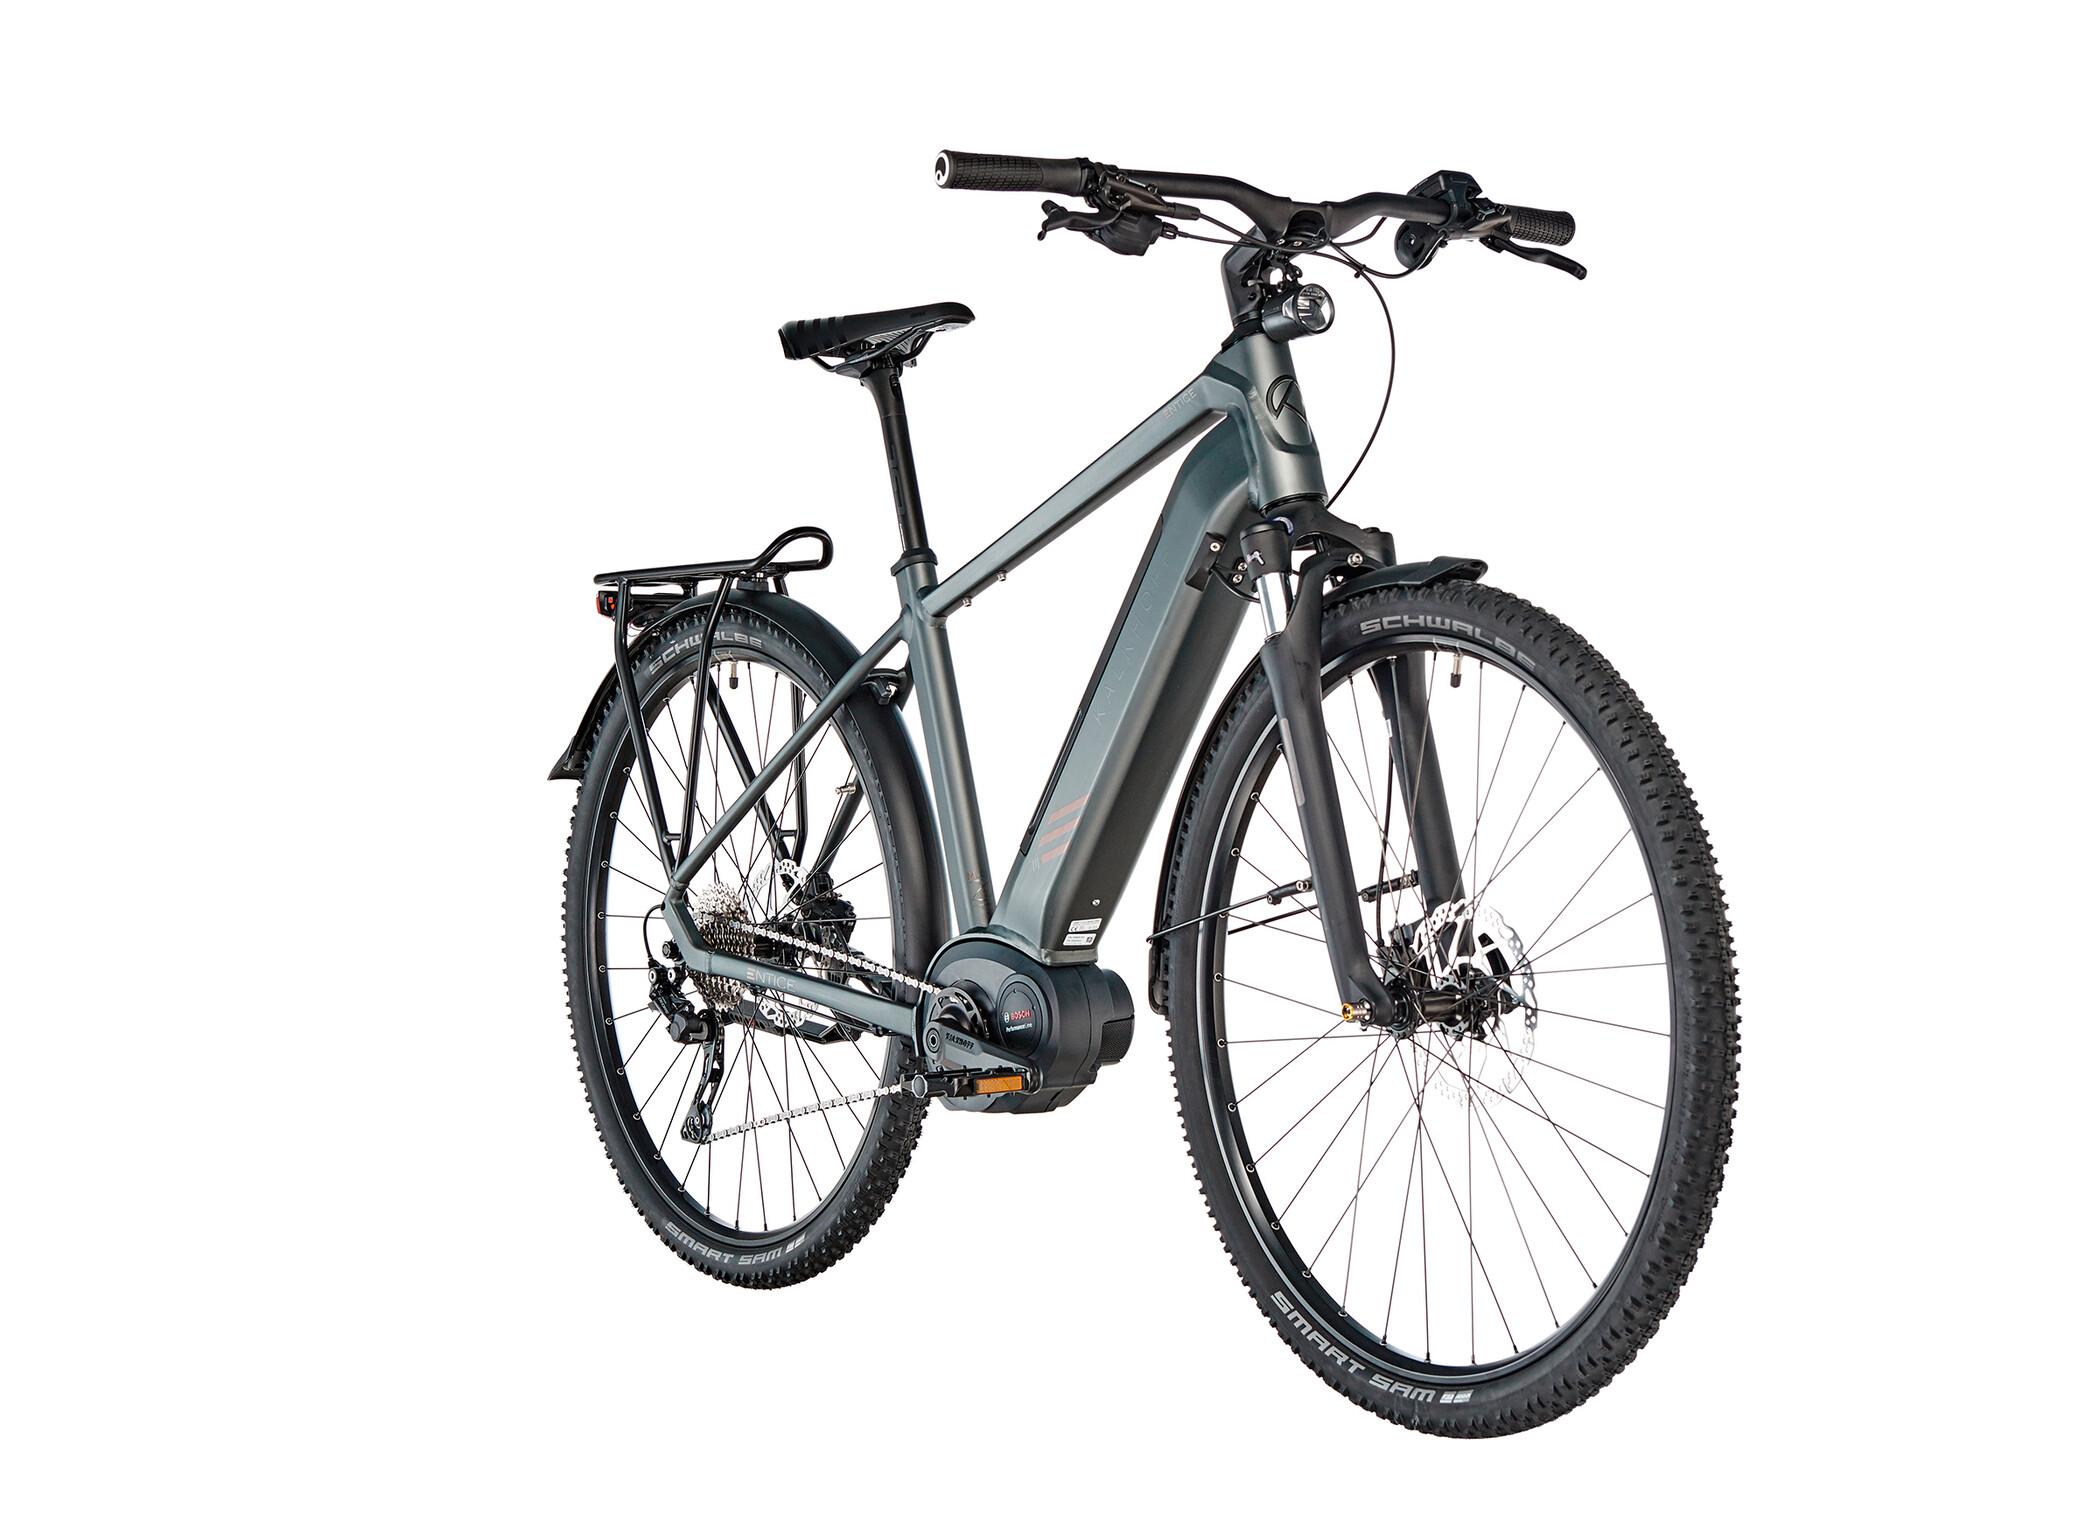 Kalkhoff Entice 5.B Tour Diamant 500Wh, shadowgrey matt | City-cykler